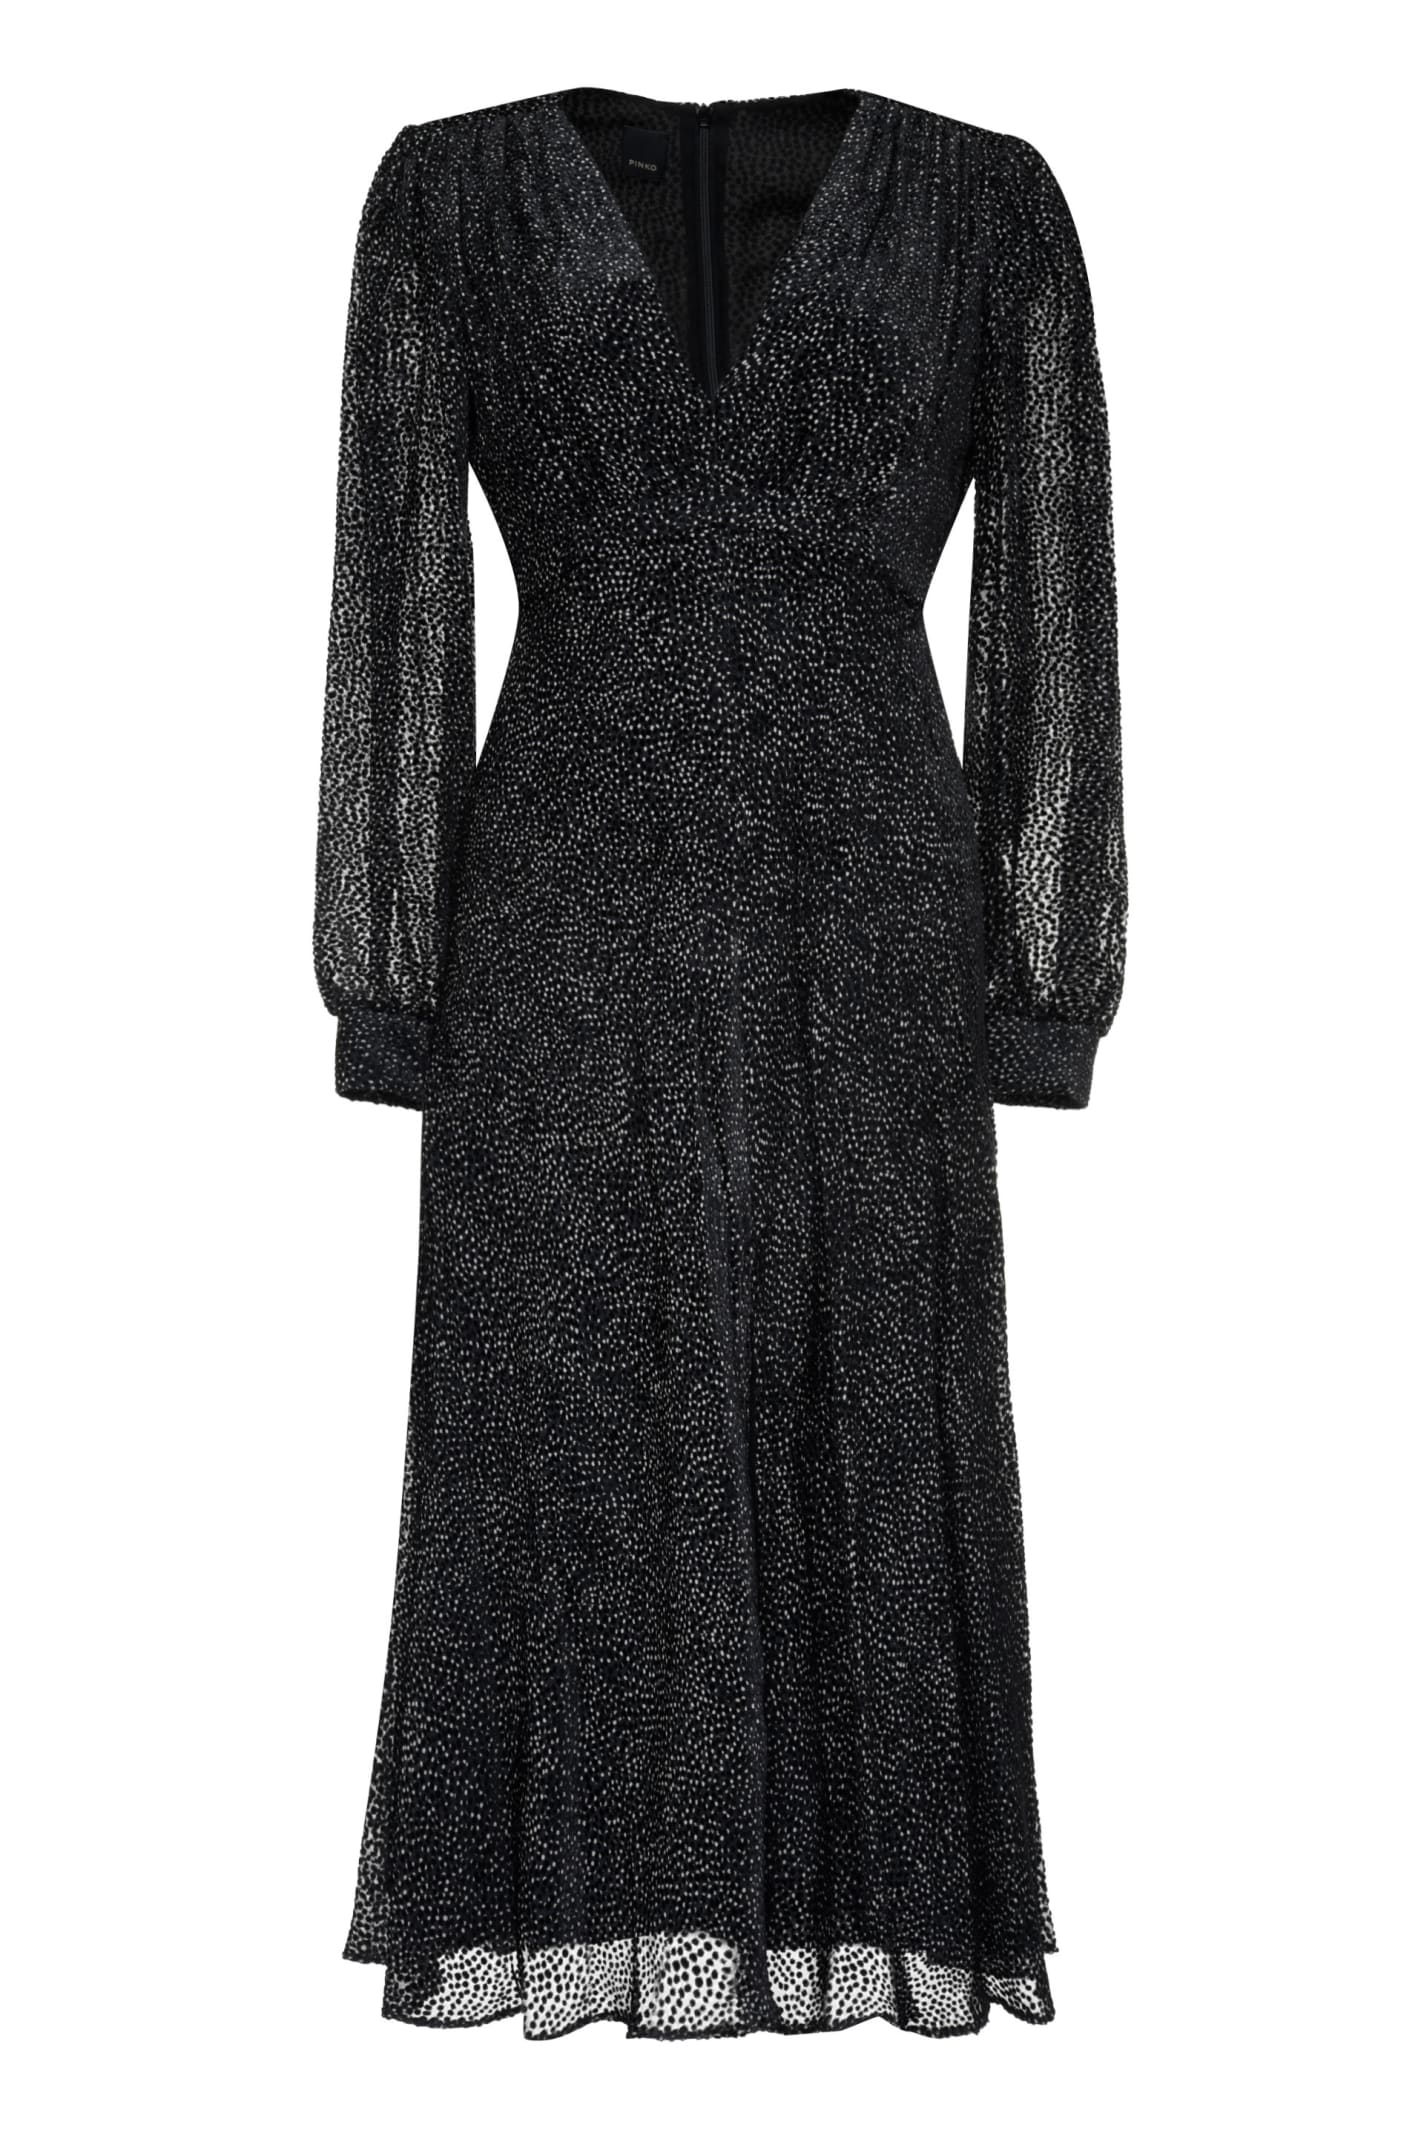 Buy Pinko Giovanni Devor?elvet Dress online, shop Pinko with free shipping